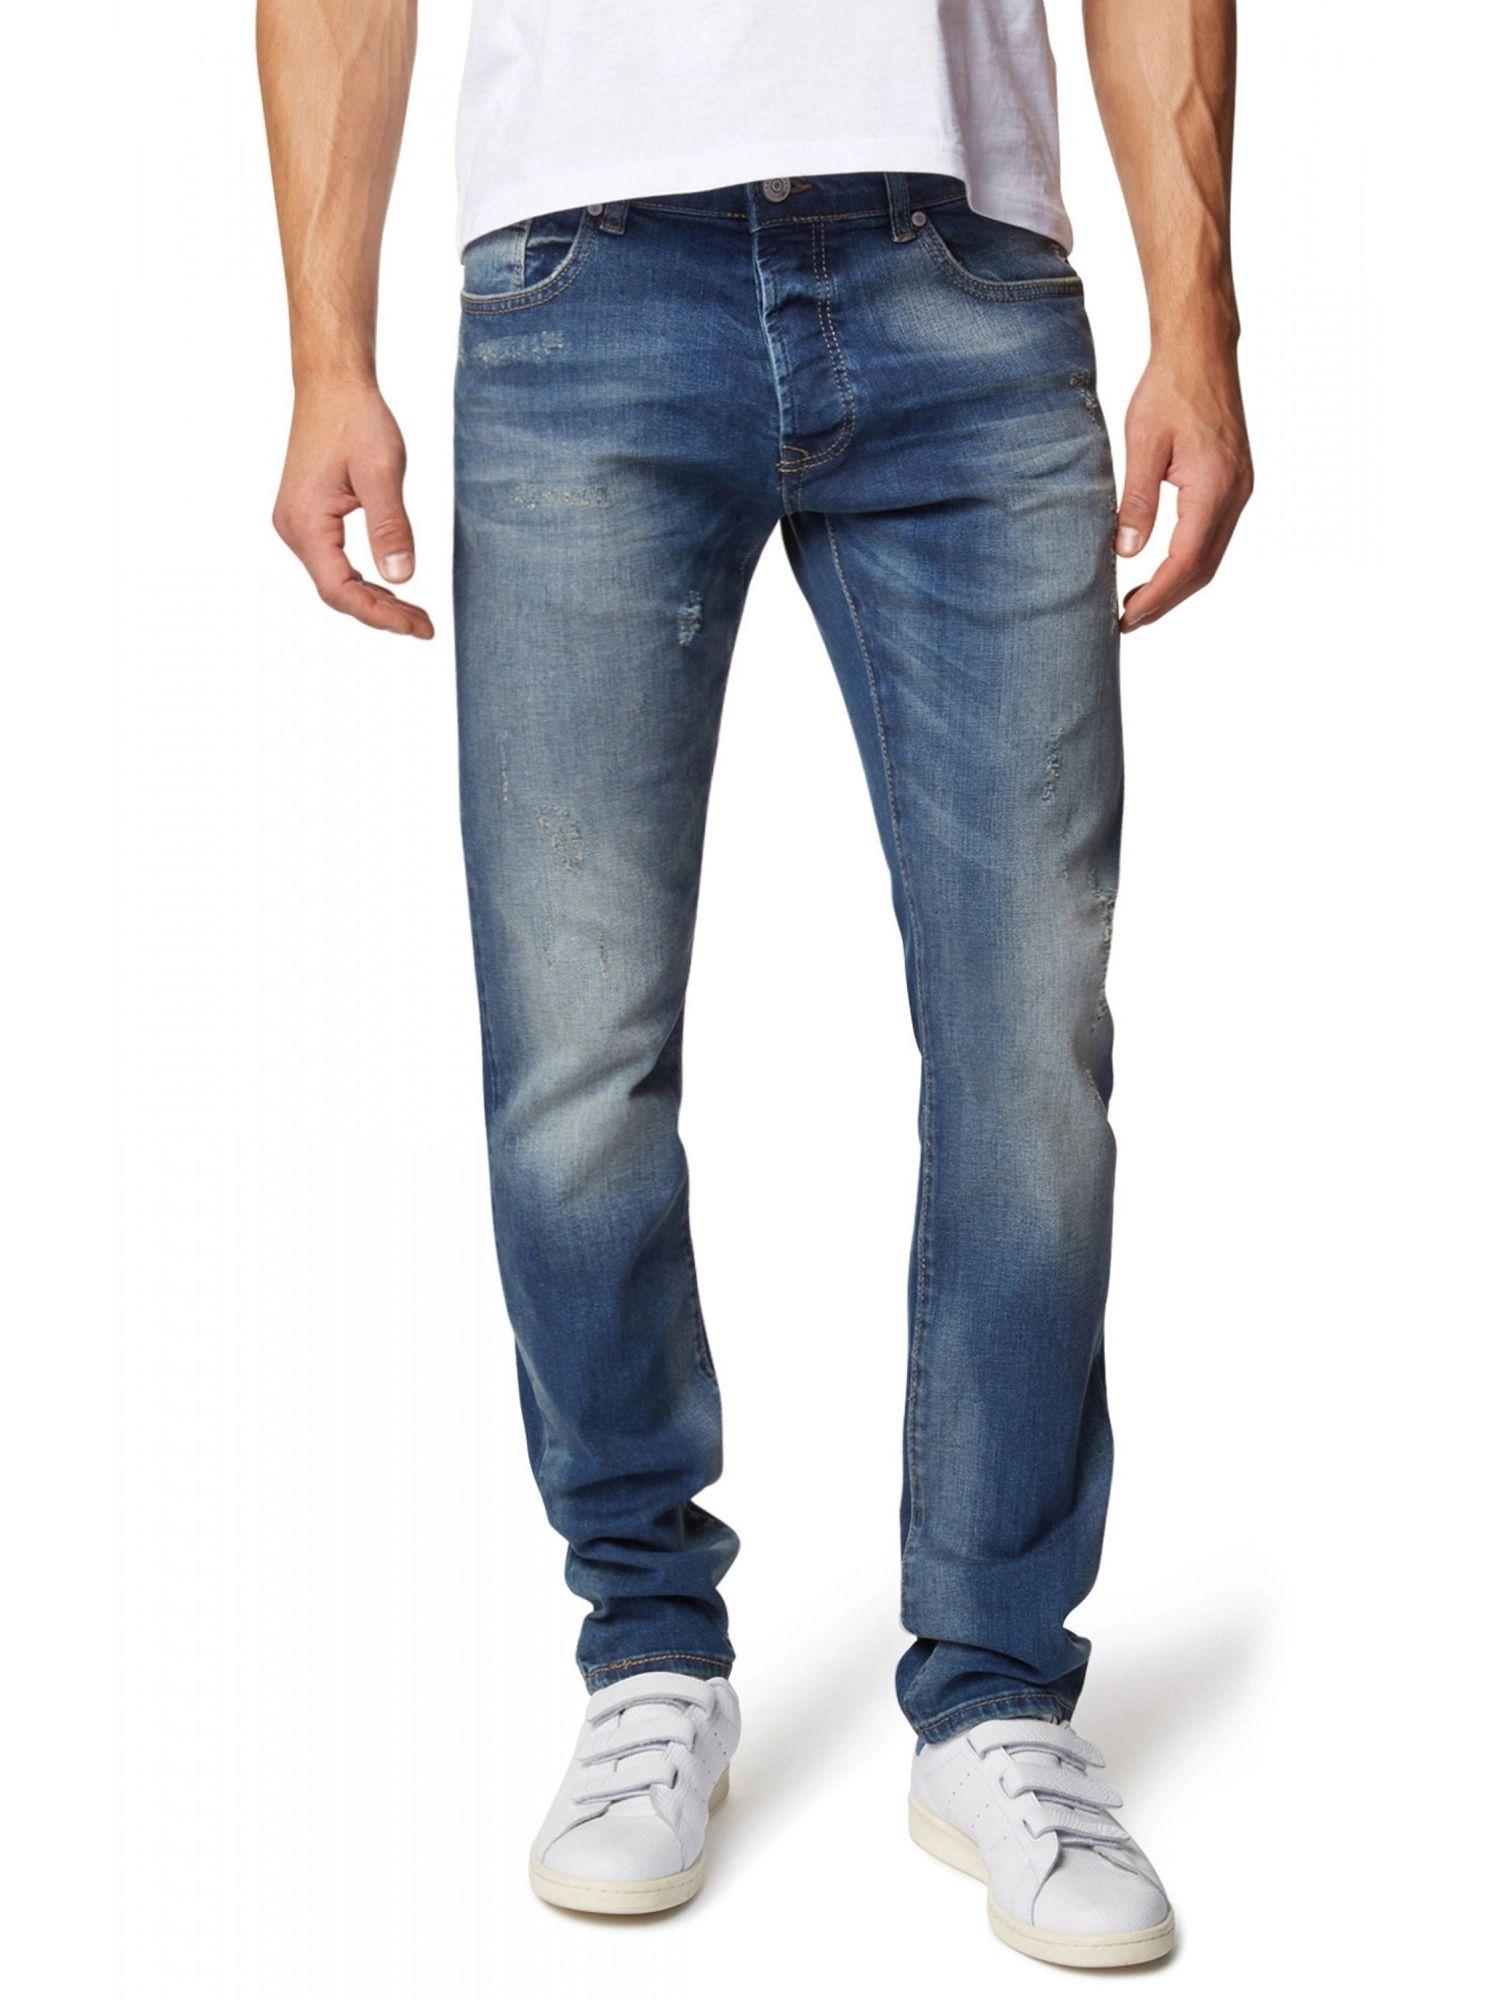 WOTEGA – Jeans Negan – blue denim